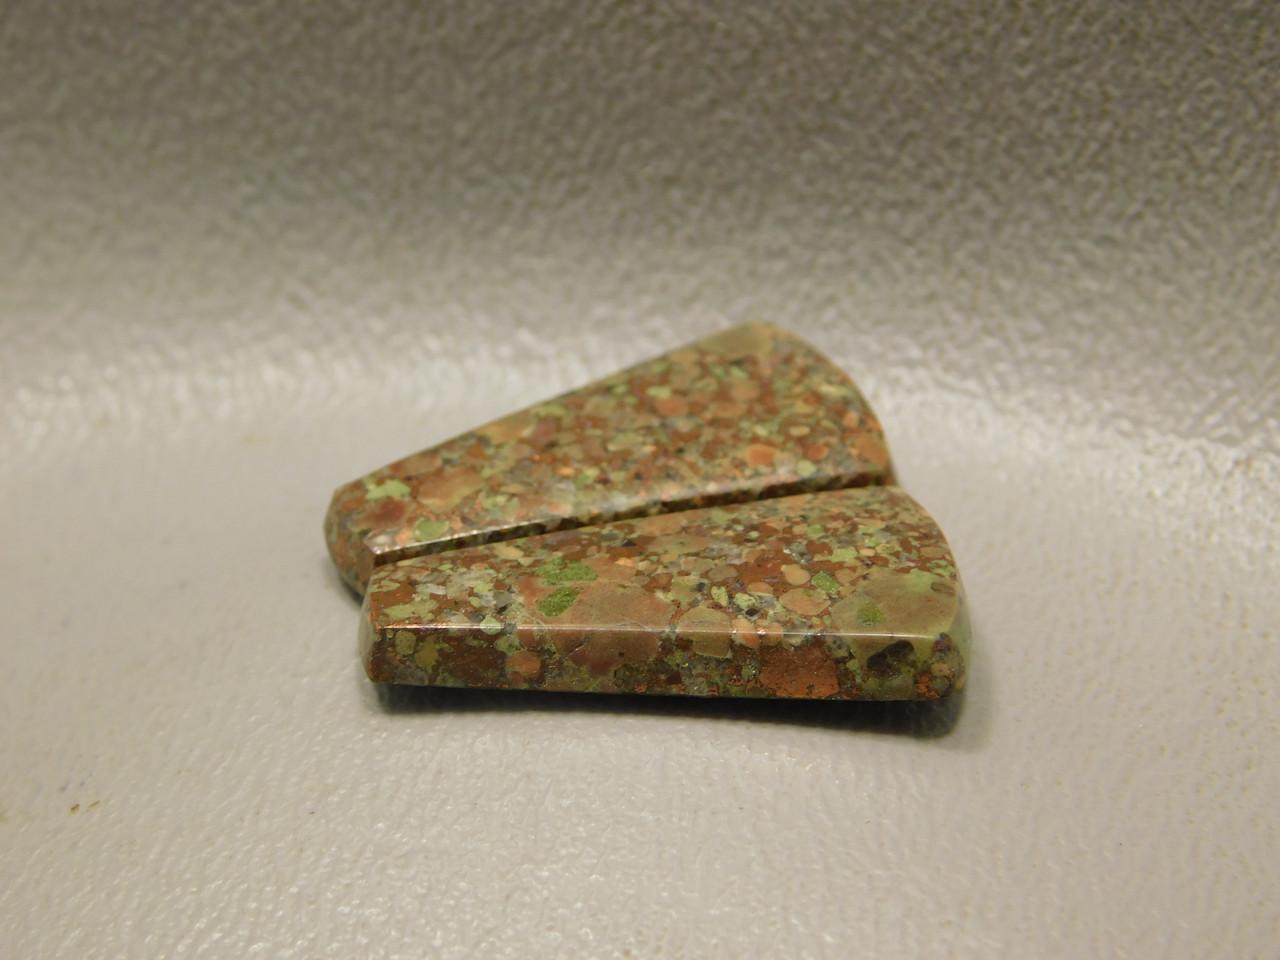 Copper Rose Semi Precious Gemstone Matched Pair Cabochons #8